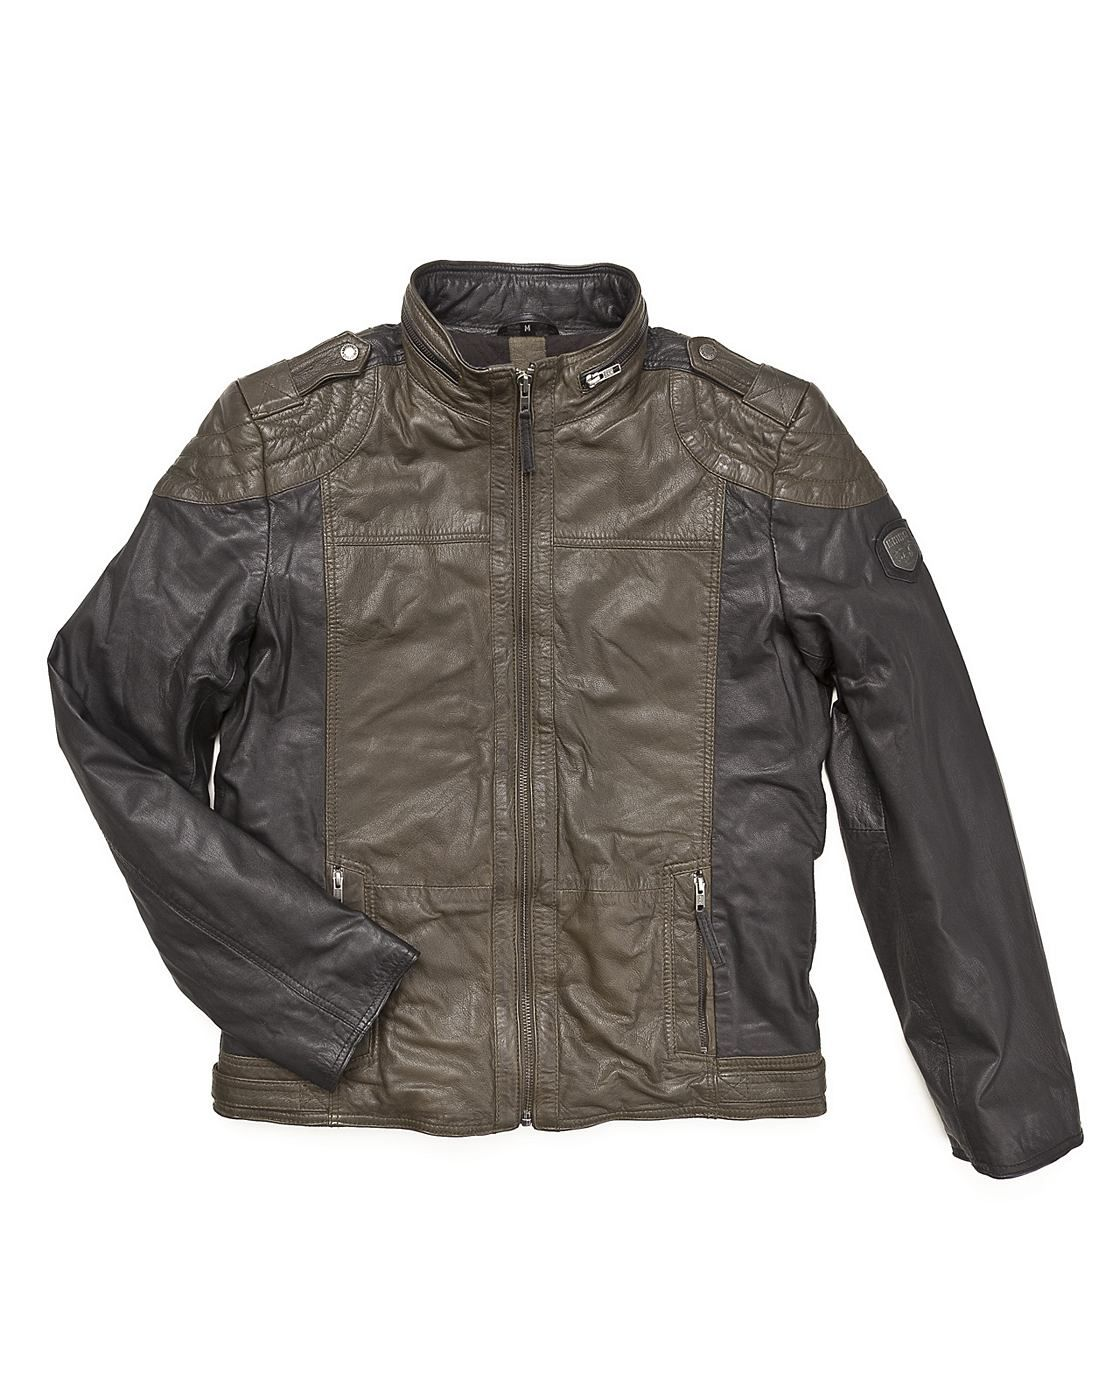 Lederjacke, Herren Kingsbury Coole Lederjacke von Mustang. Diese Jacke im  Bikerstyle besitzt zwei Reißverschlusstaschen b0e9261844